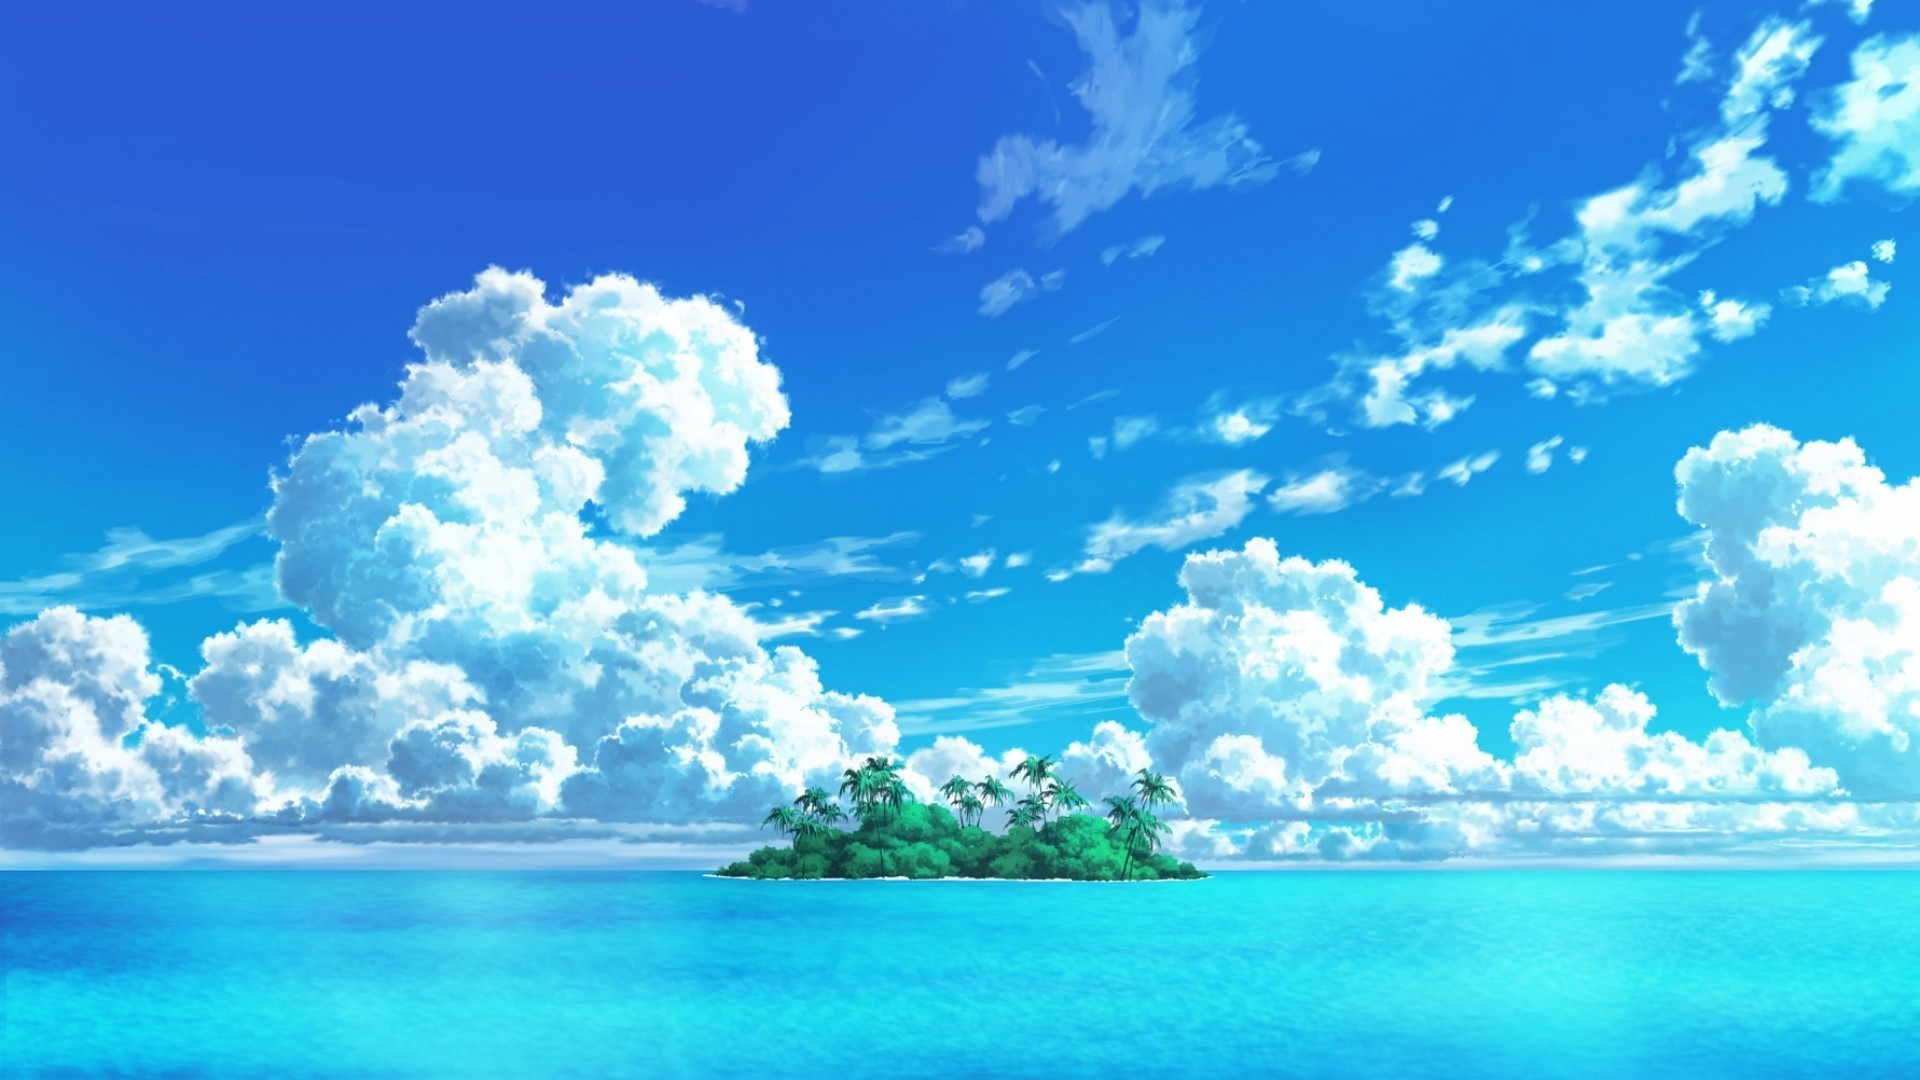 Anime Beach Wallpaper theme